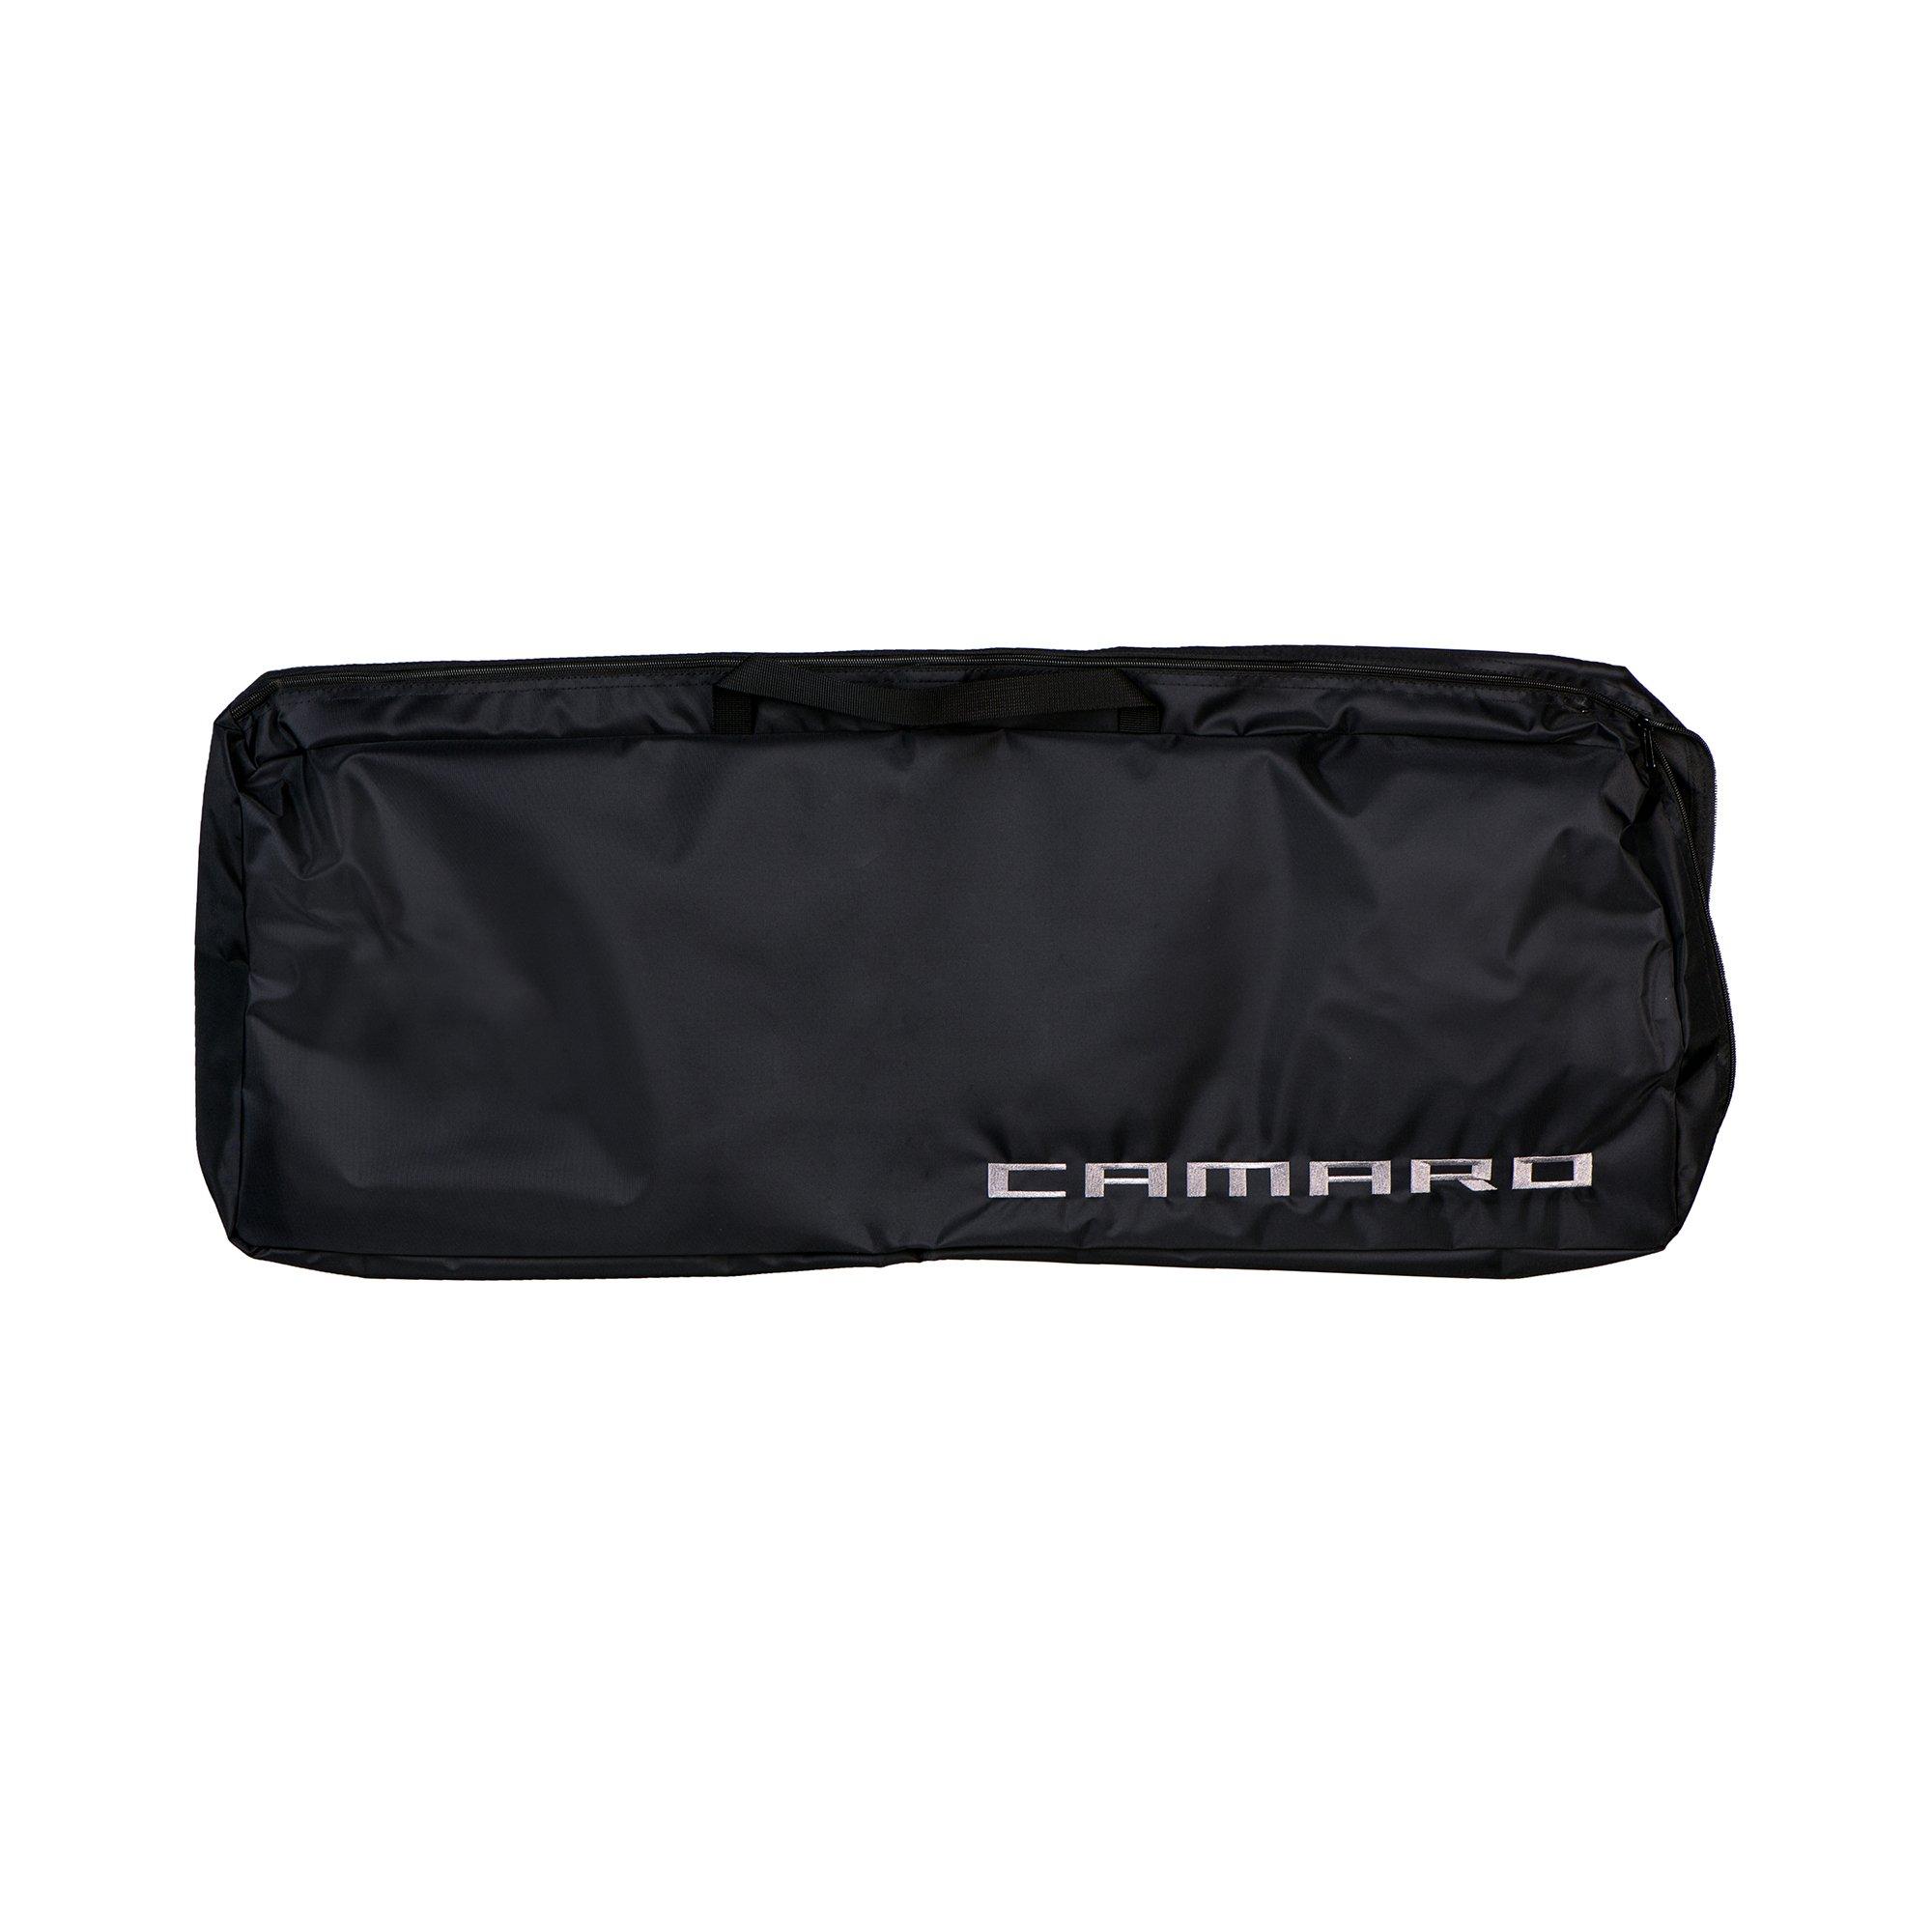 OEM NEW Tonneau Cover Storage Bag Black w/ Camaro Logo 11-15 Chevrolet 22855148